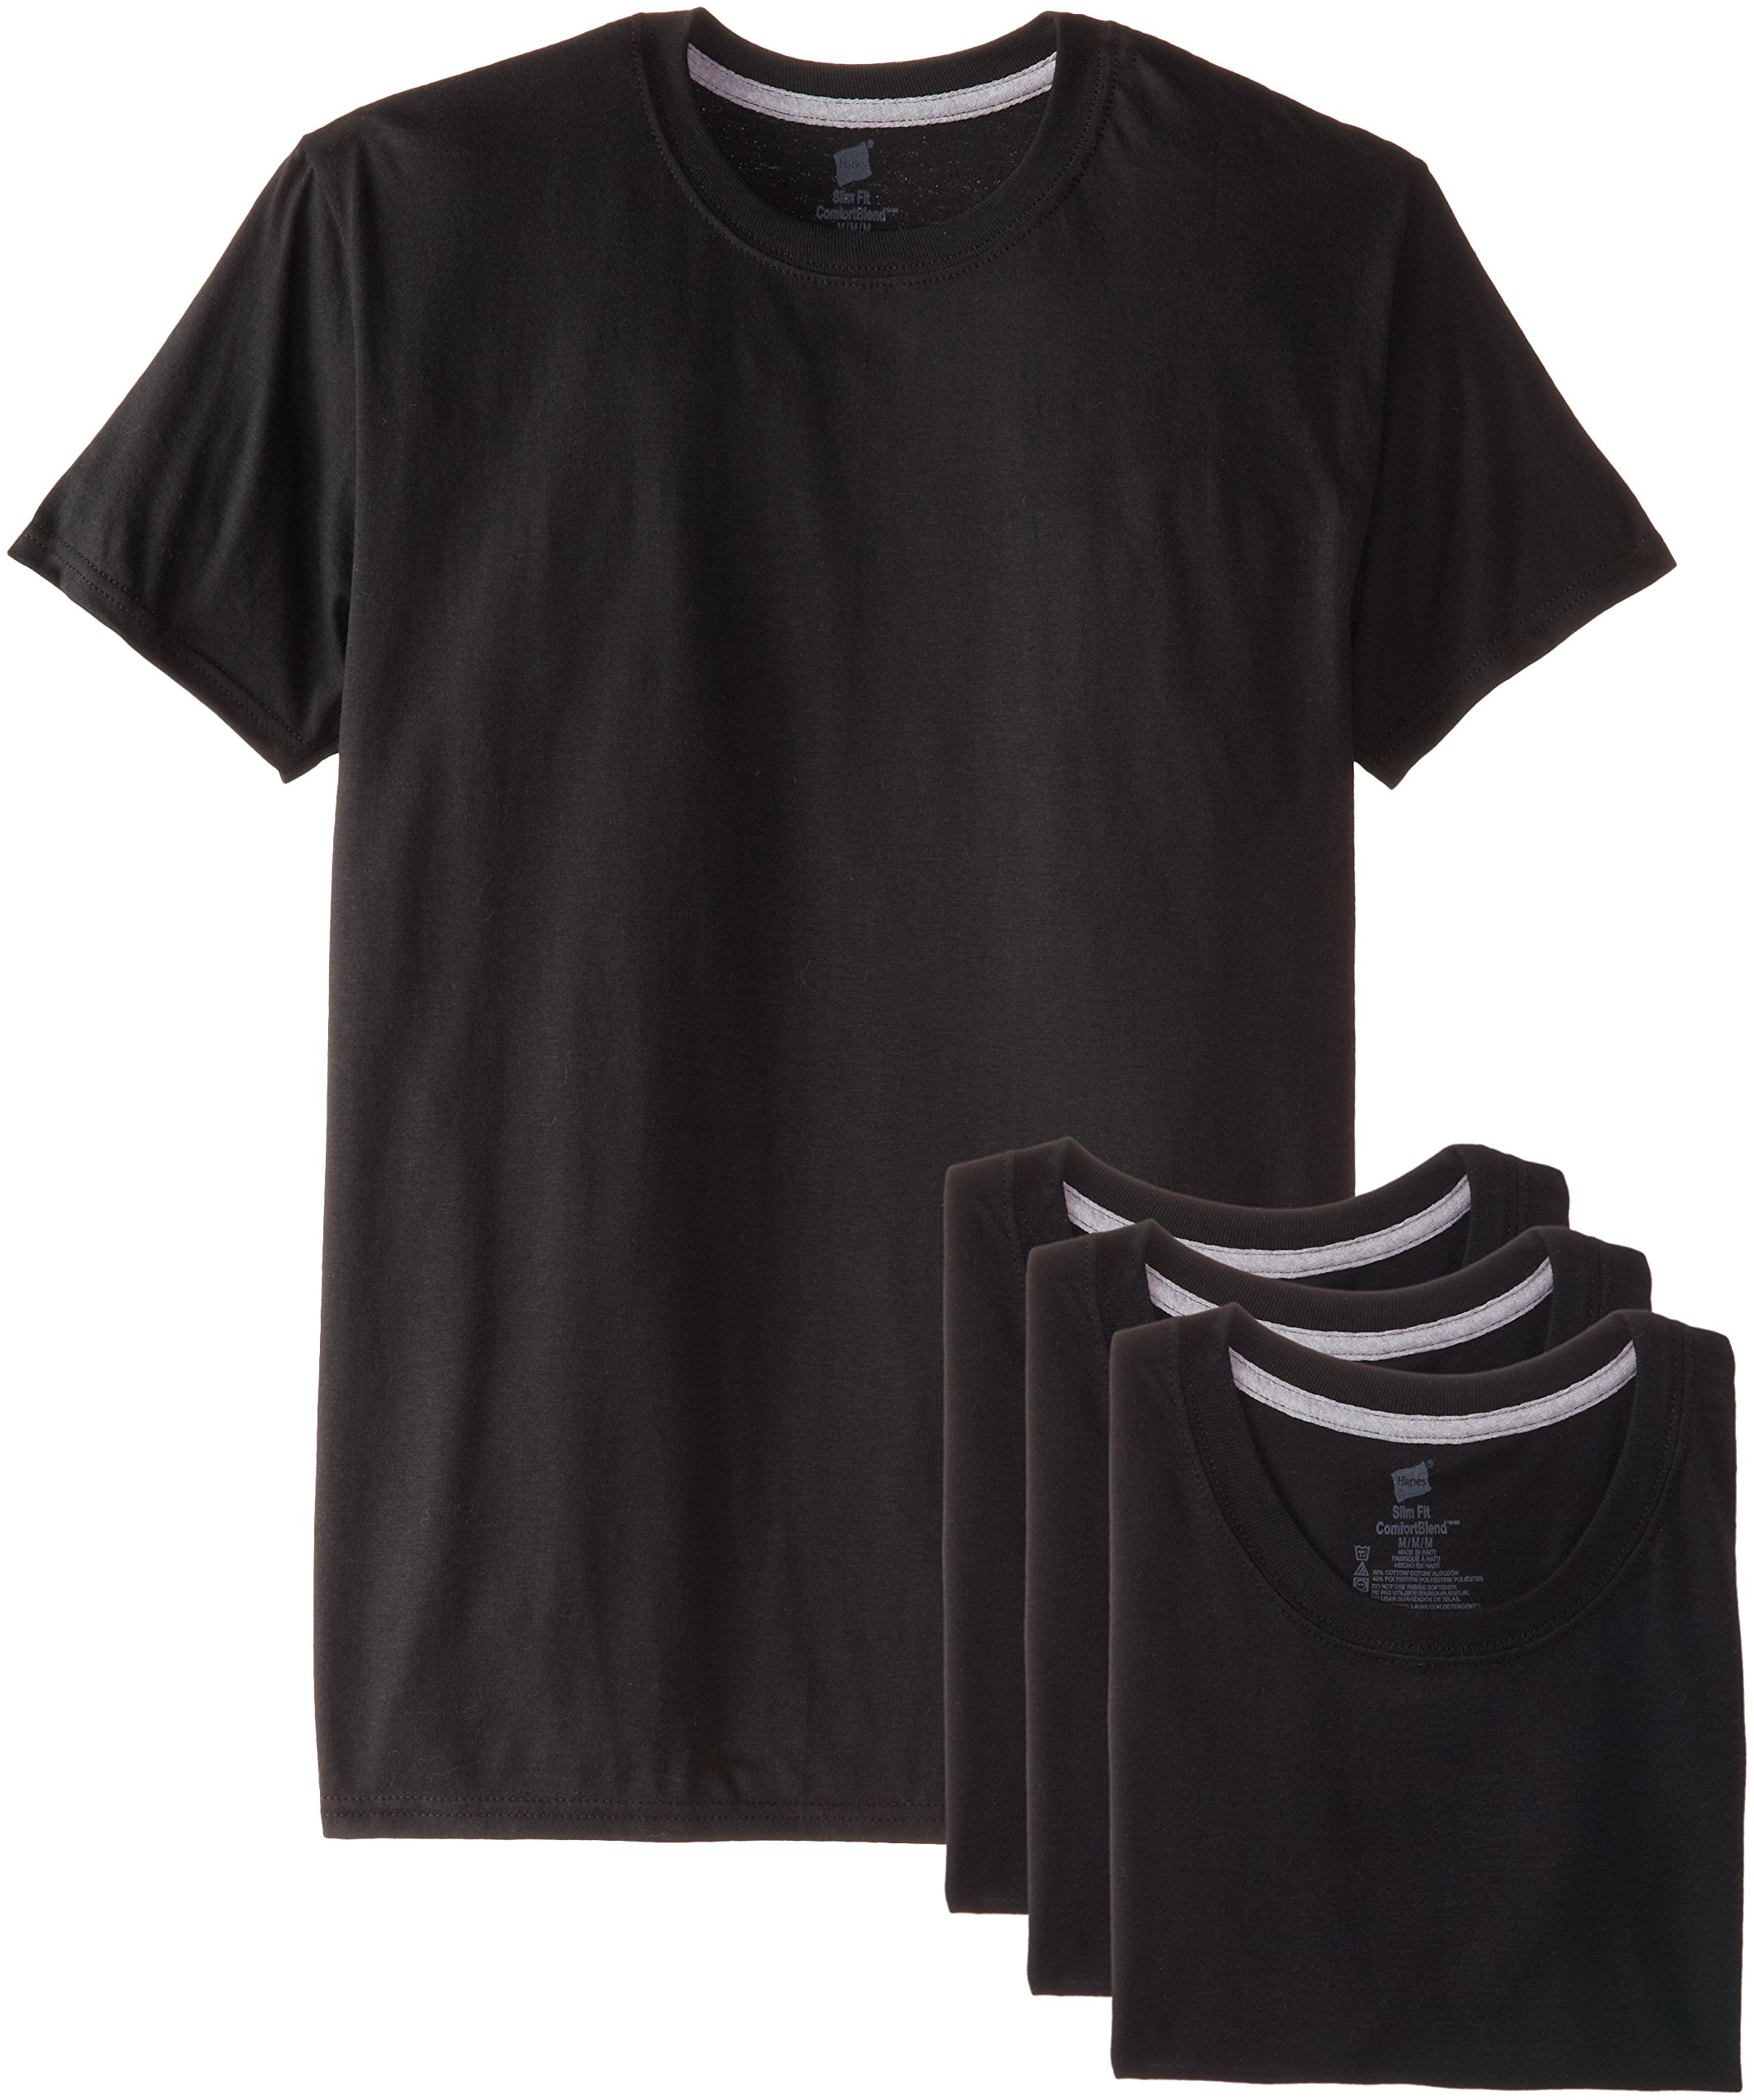 Hanes Ultimate Men's 4-Pack FreshIQ Black Slim Fit Crew T-Shirt,Black,X-Large